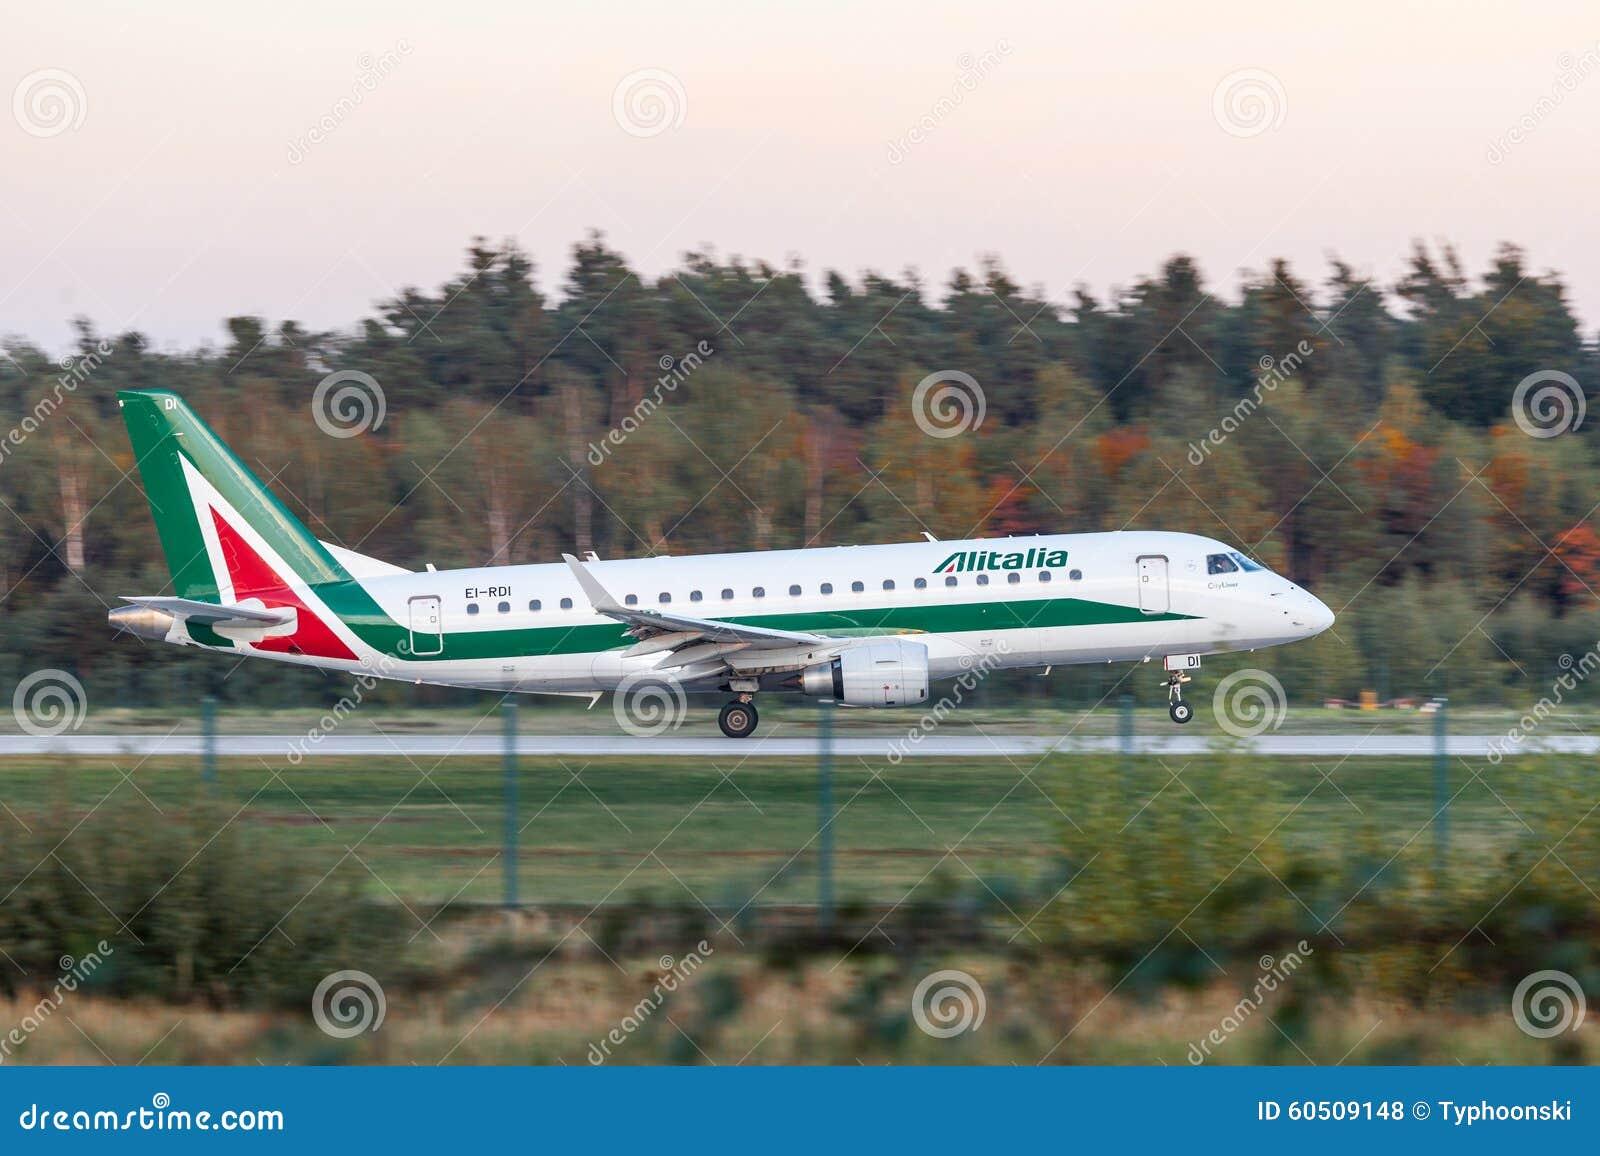 Alitalia Embraer 170 Am Frankfurt Flughafen Redaktionelles Stockfoto